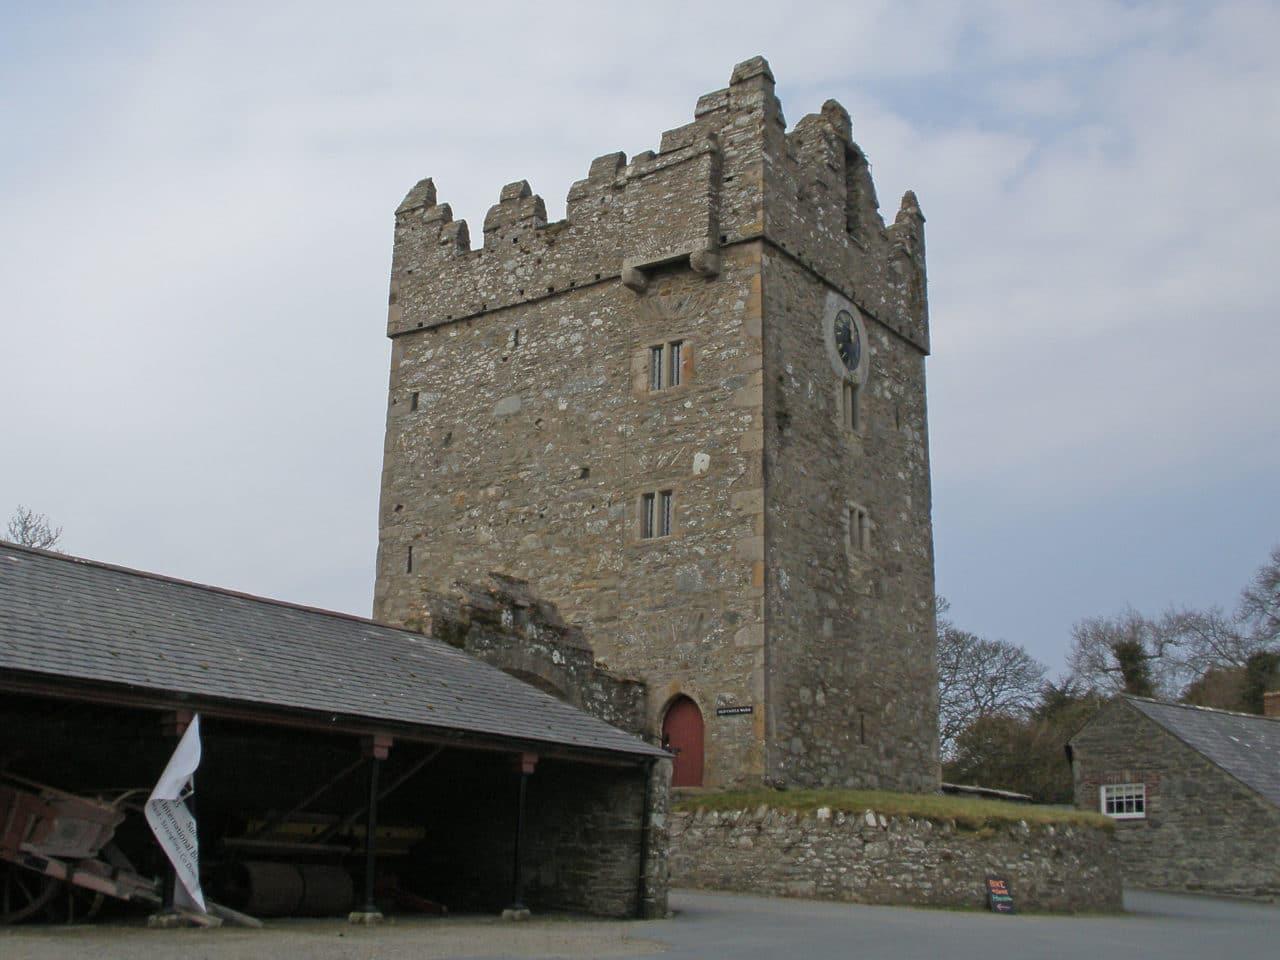 Strangford Lough - Castle Ward